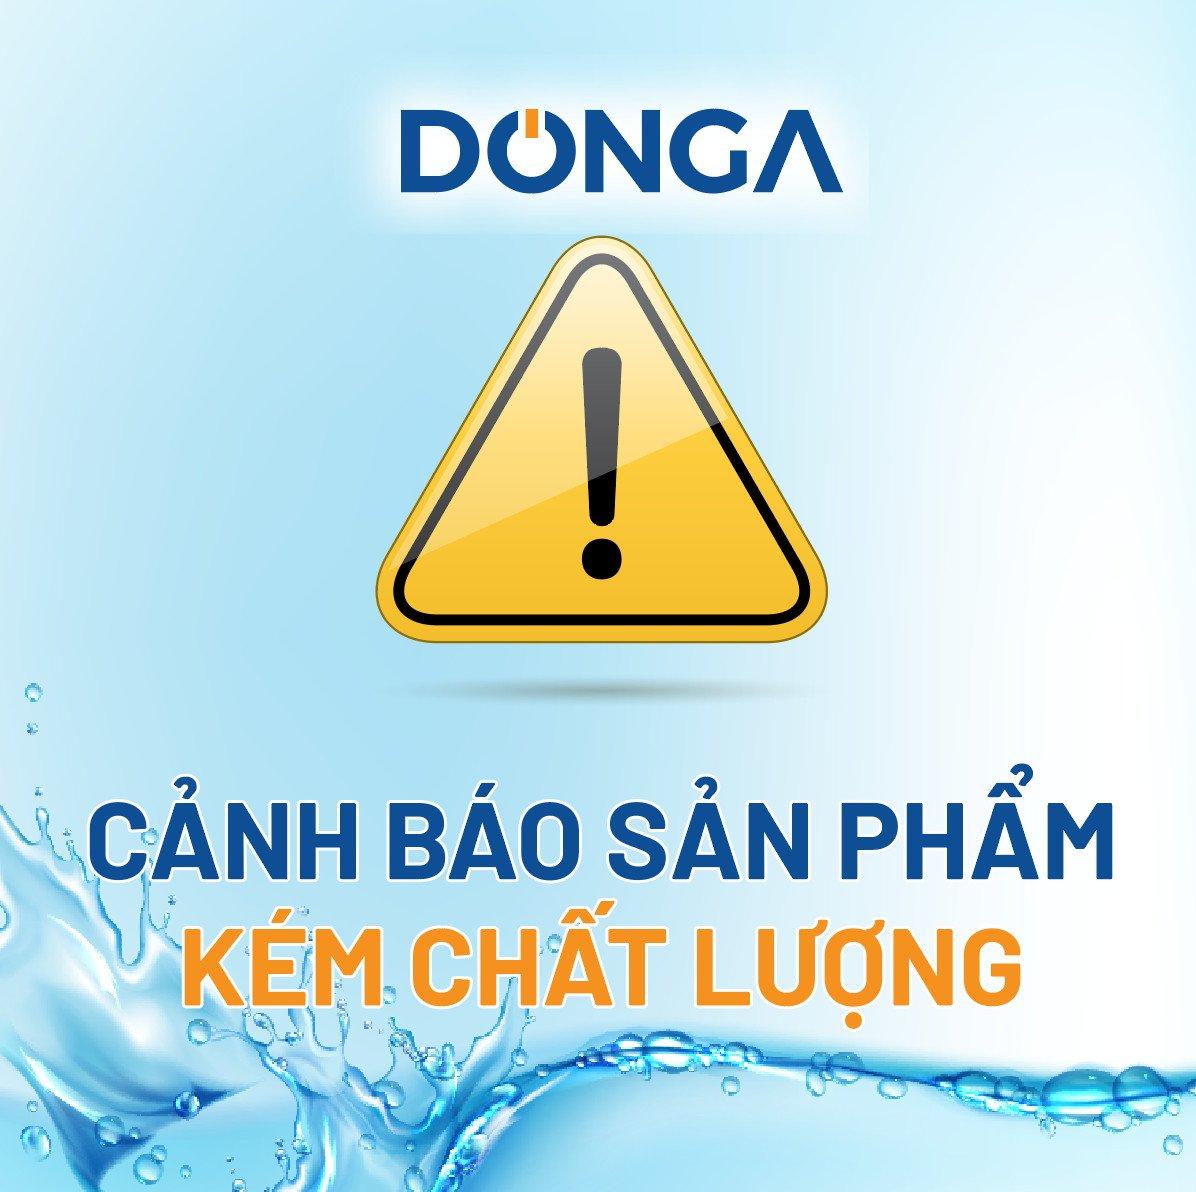 tst corp canh bao san pham kem chat luong